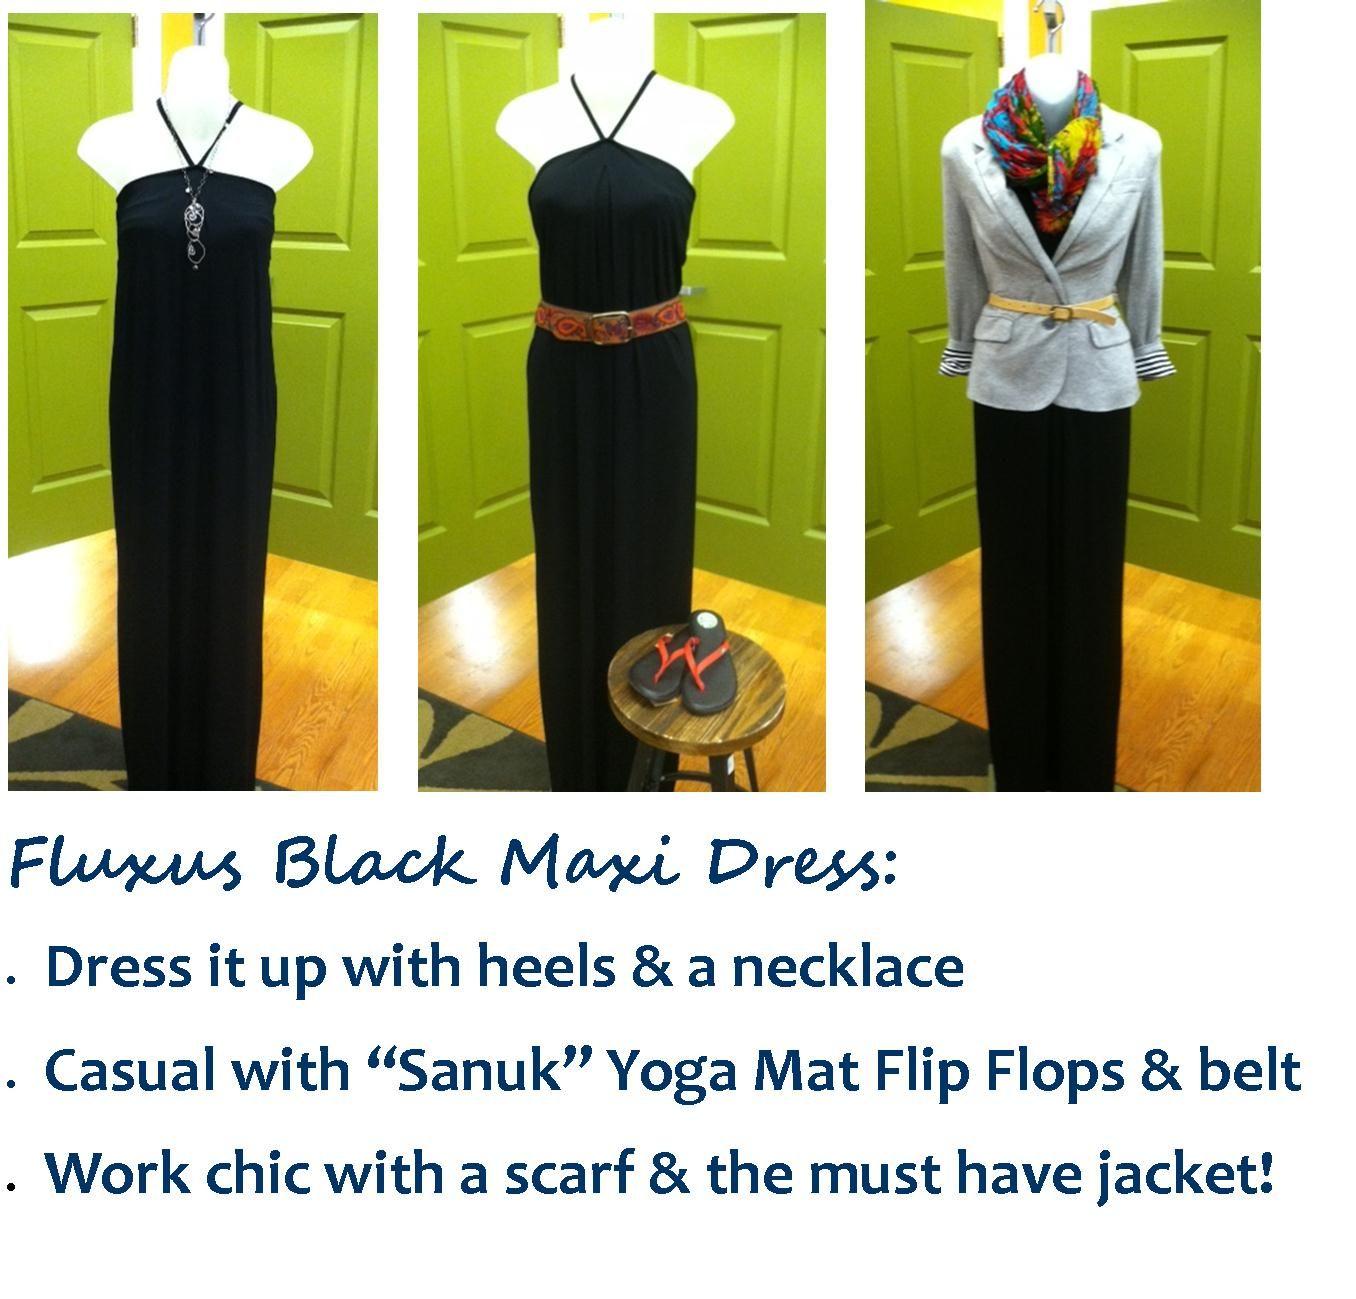 Black maxi dress ways love the soft fabric u comfort slice of